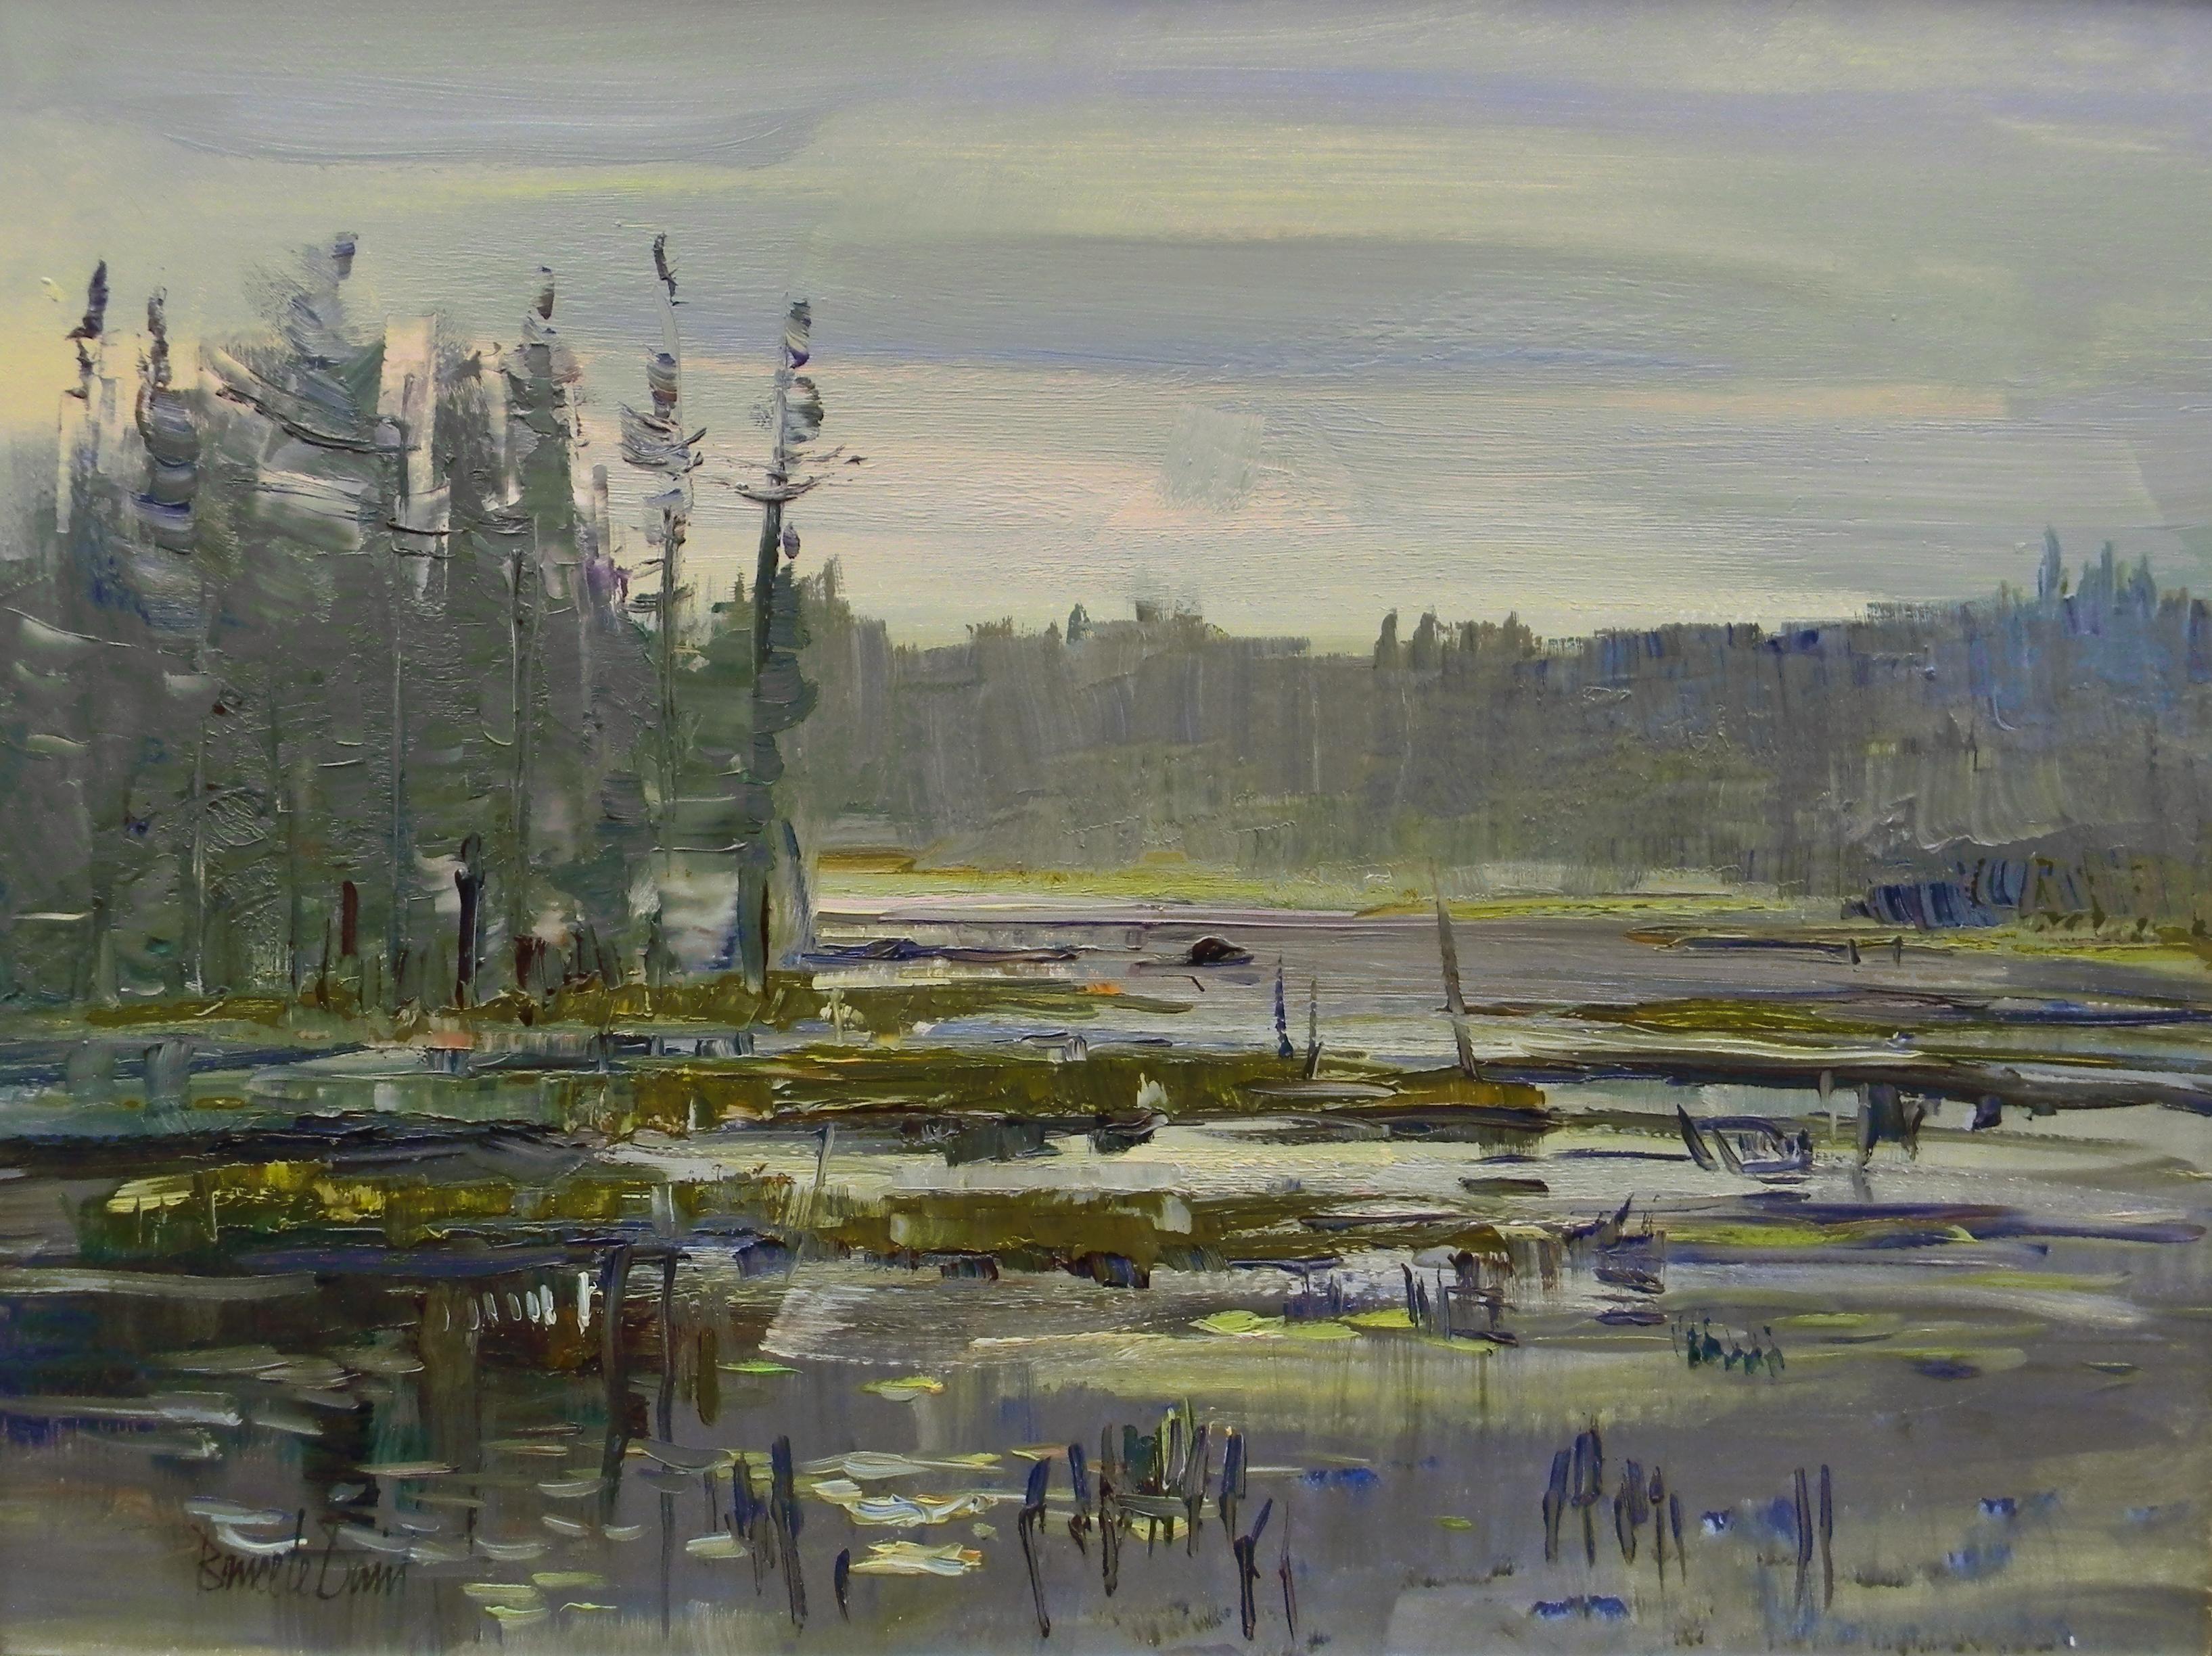 Gunning Cove, Nova Scotia